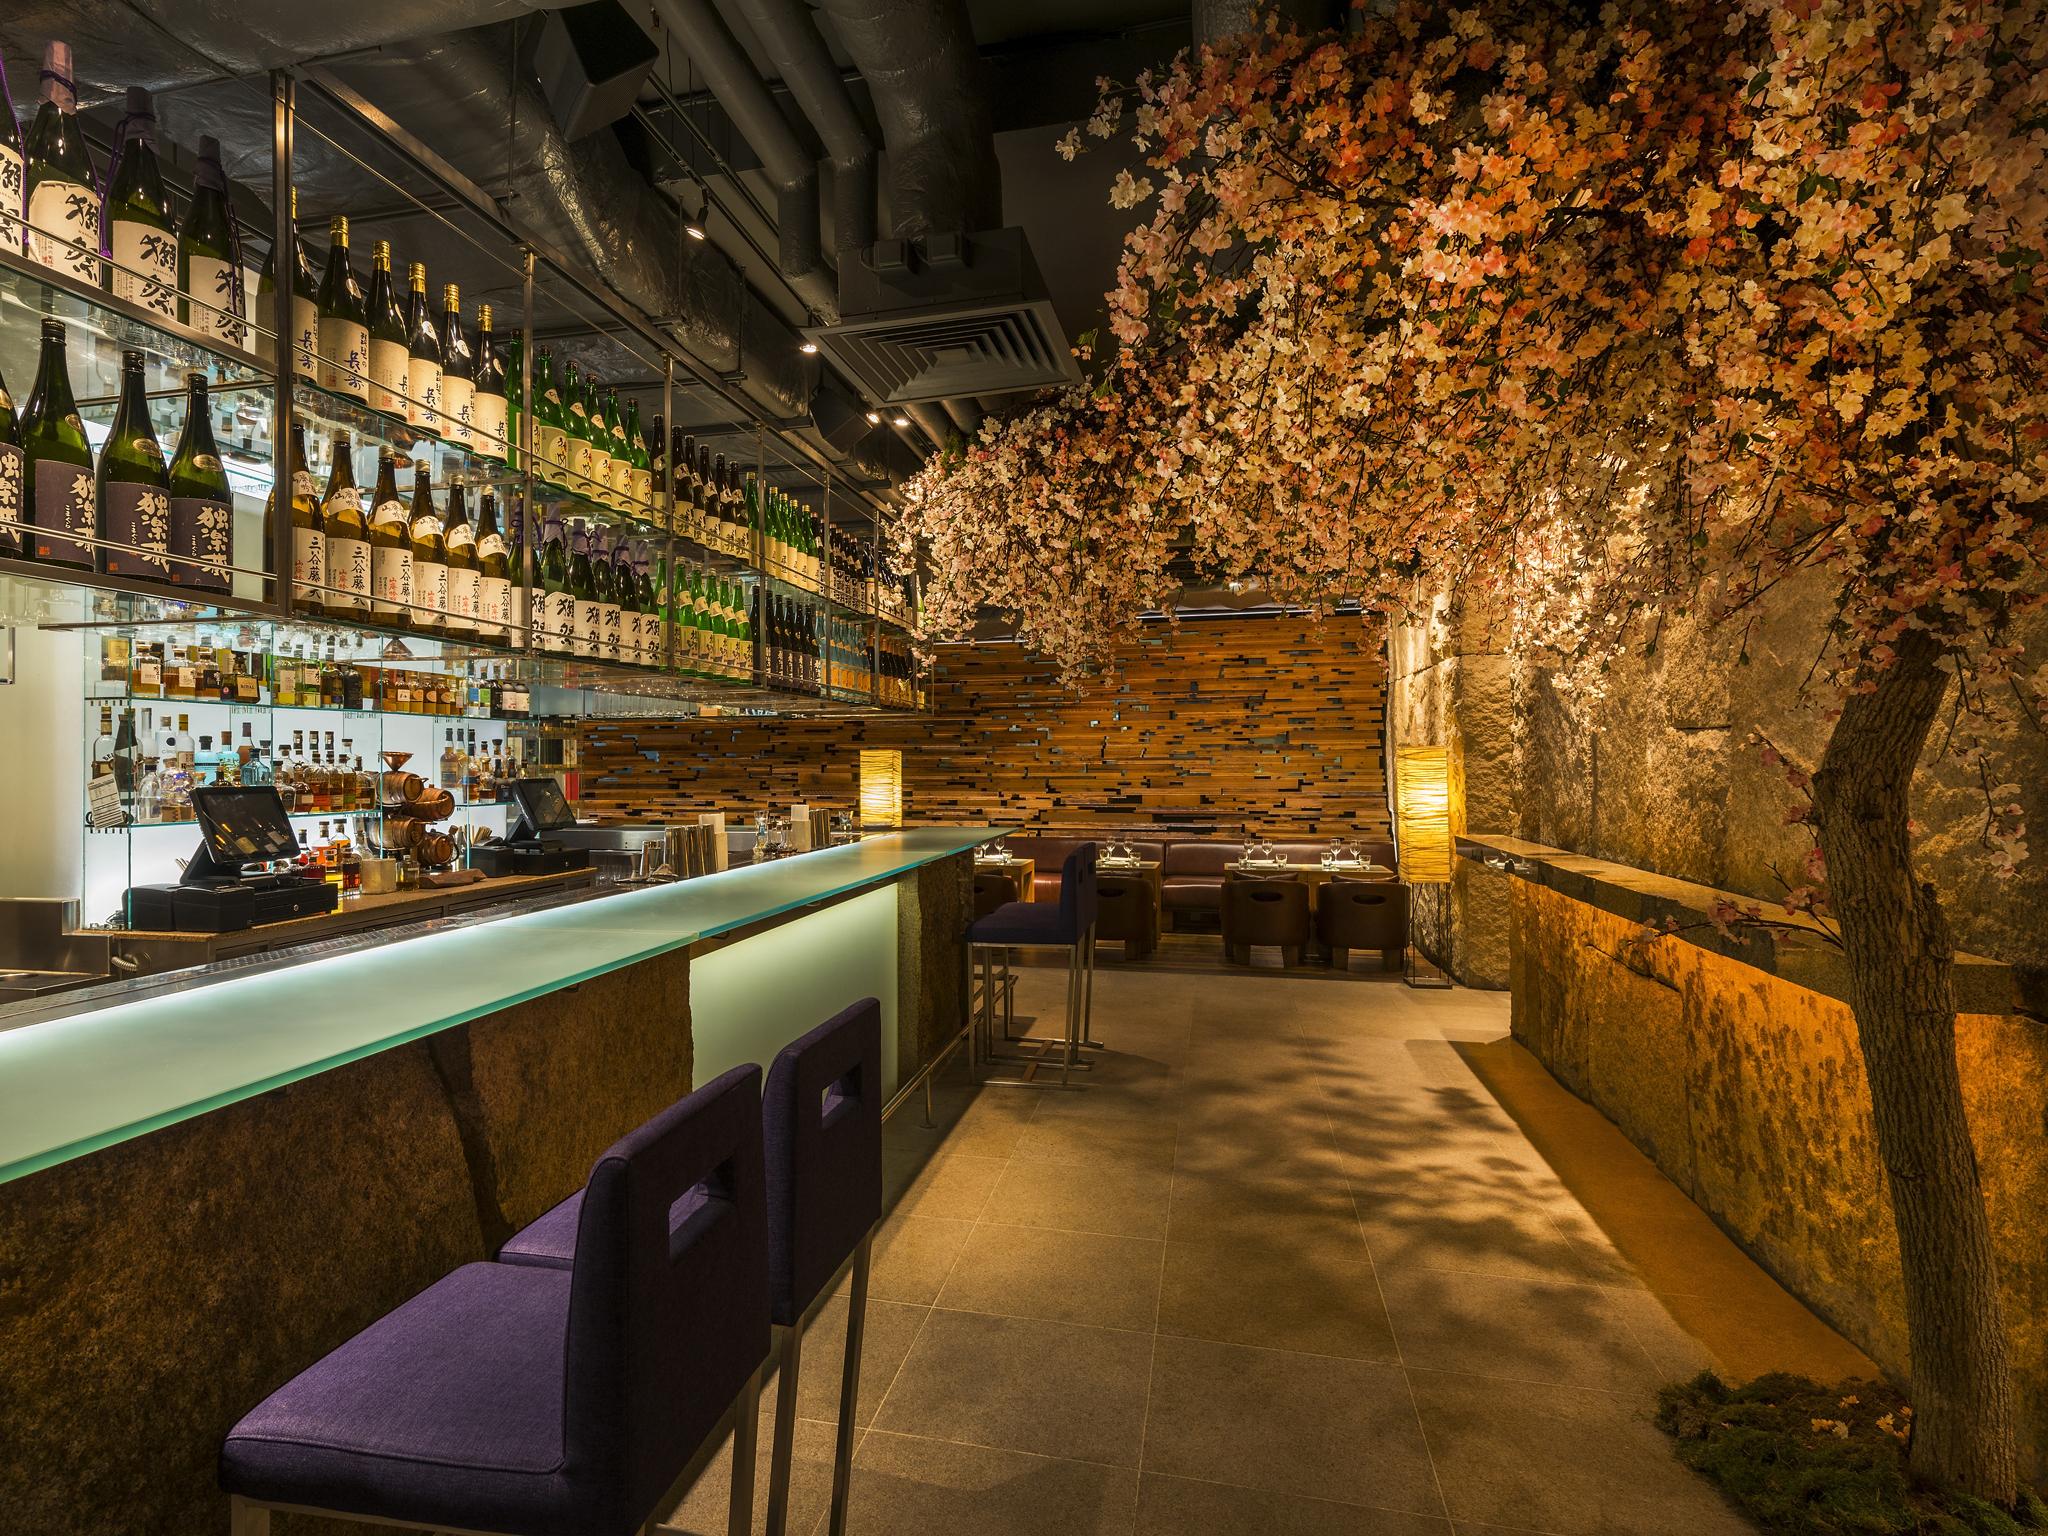 zuma, london's best blossom bars